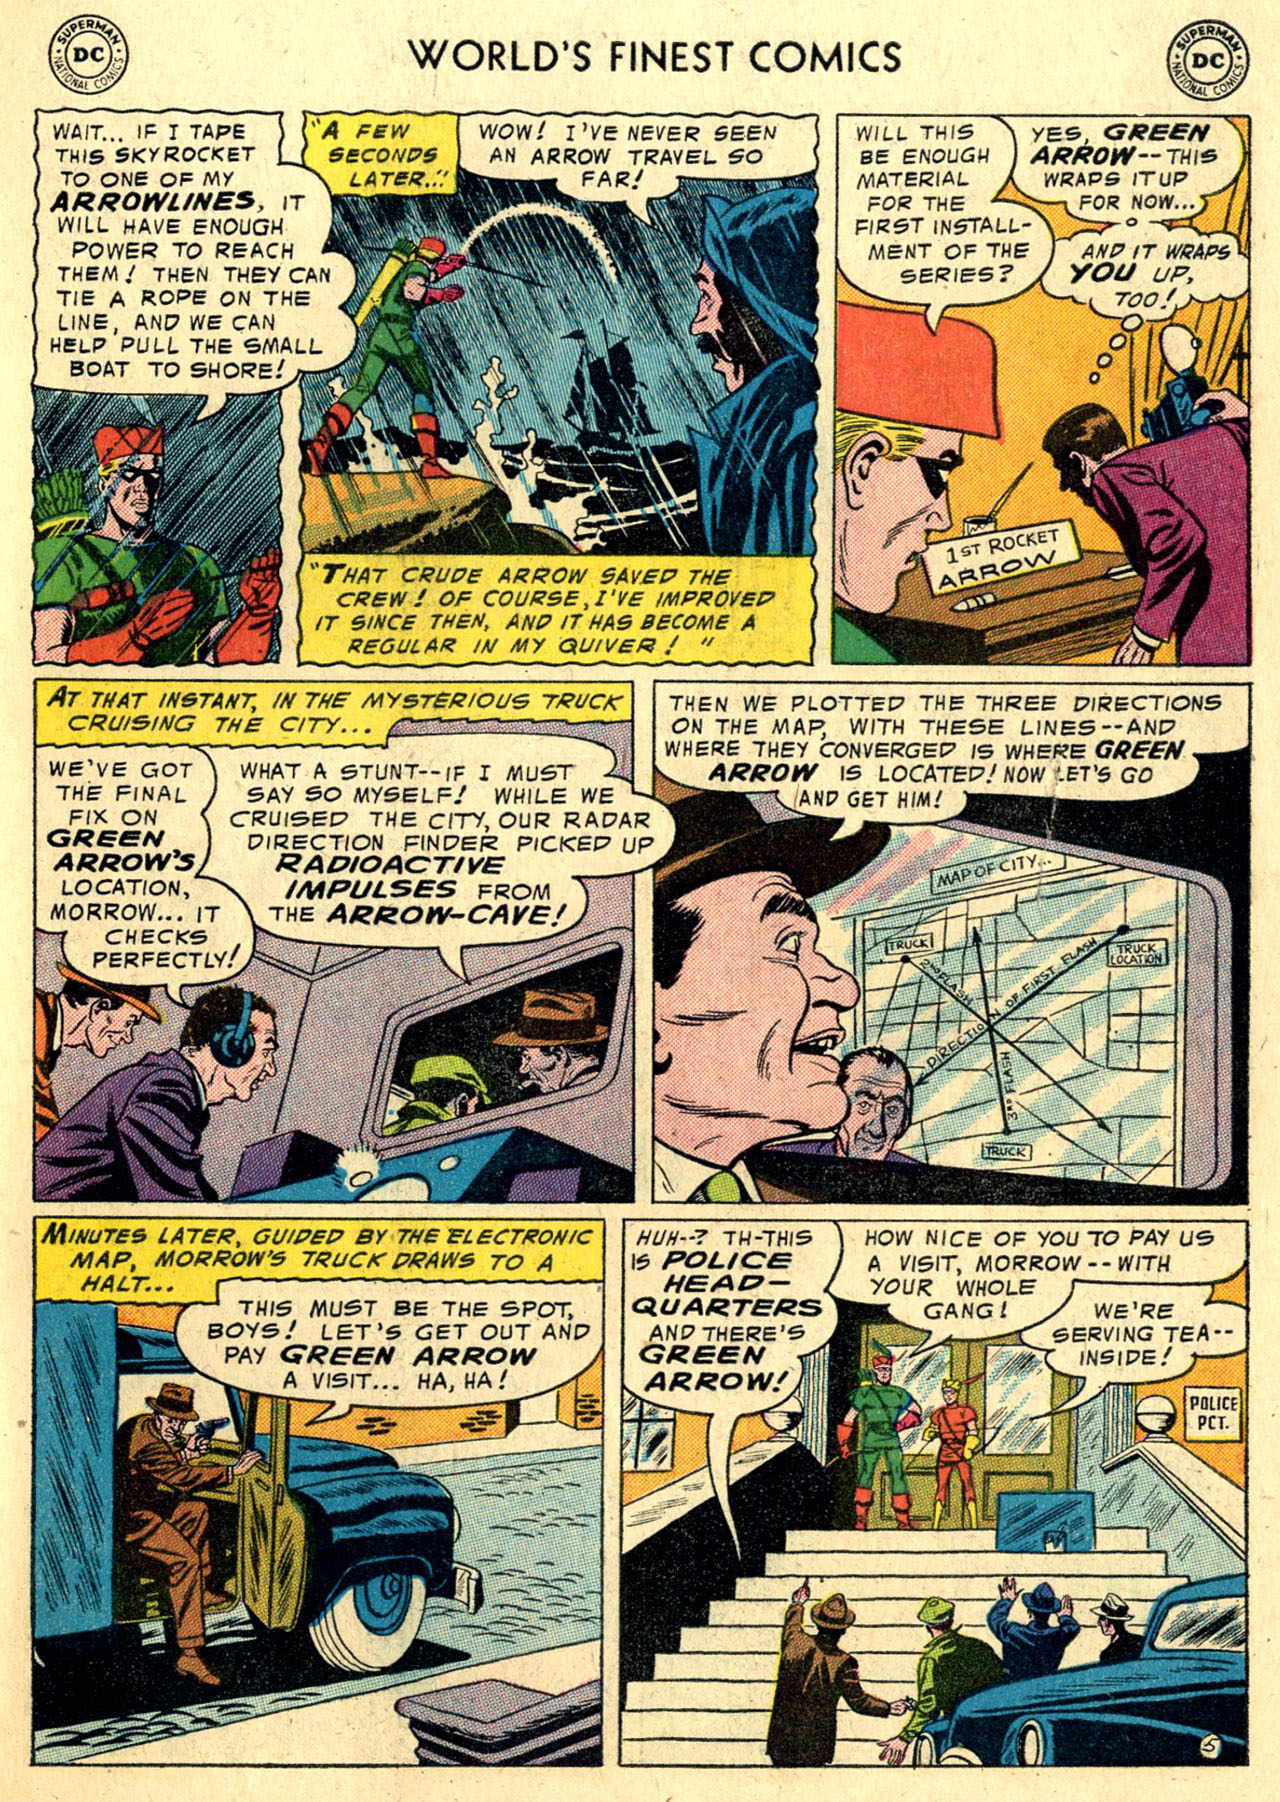 Read online World's Finest Comics comic -  Issue #82 - 30